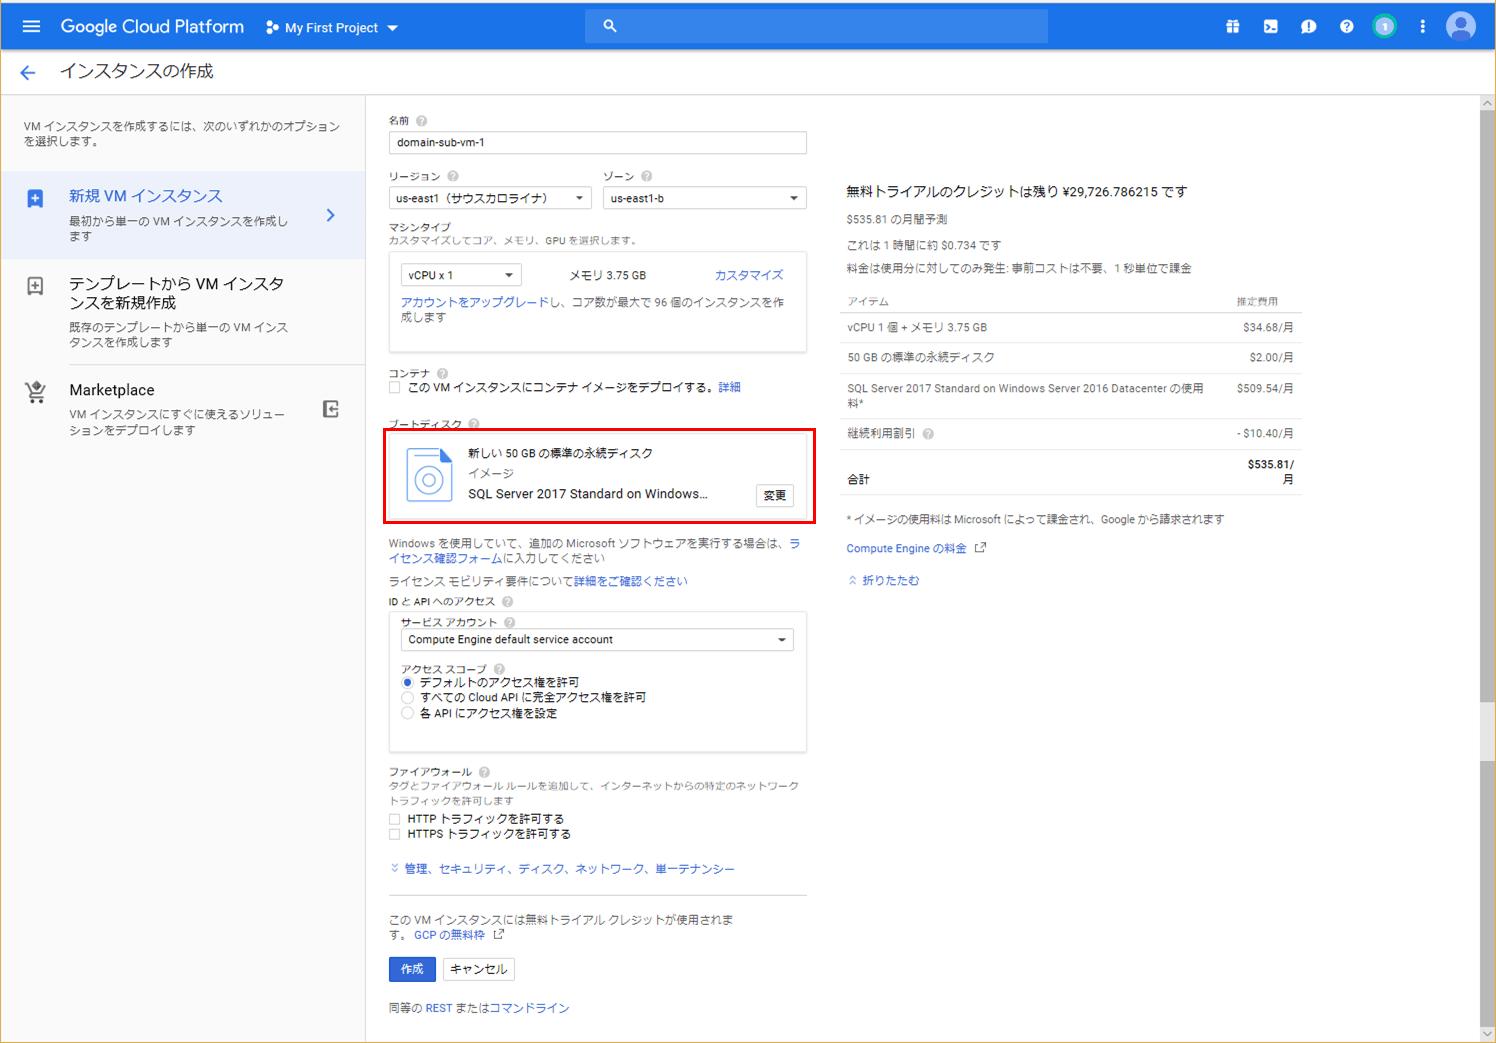 sub-vm-1仮想マシン